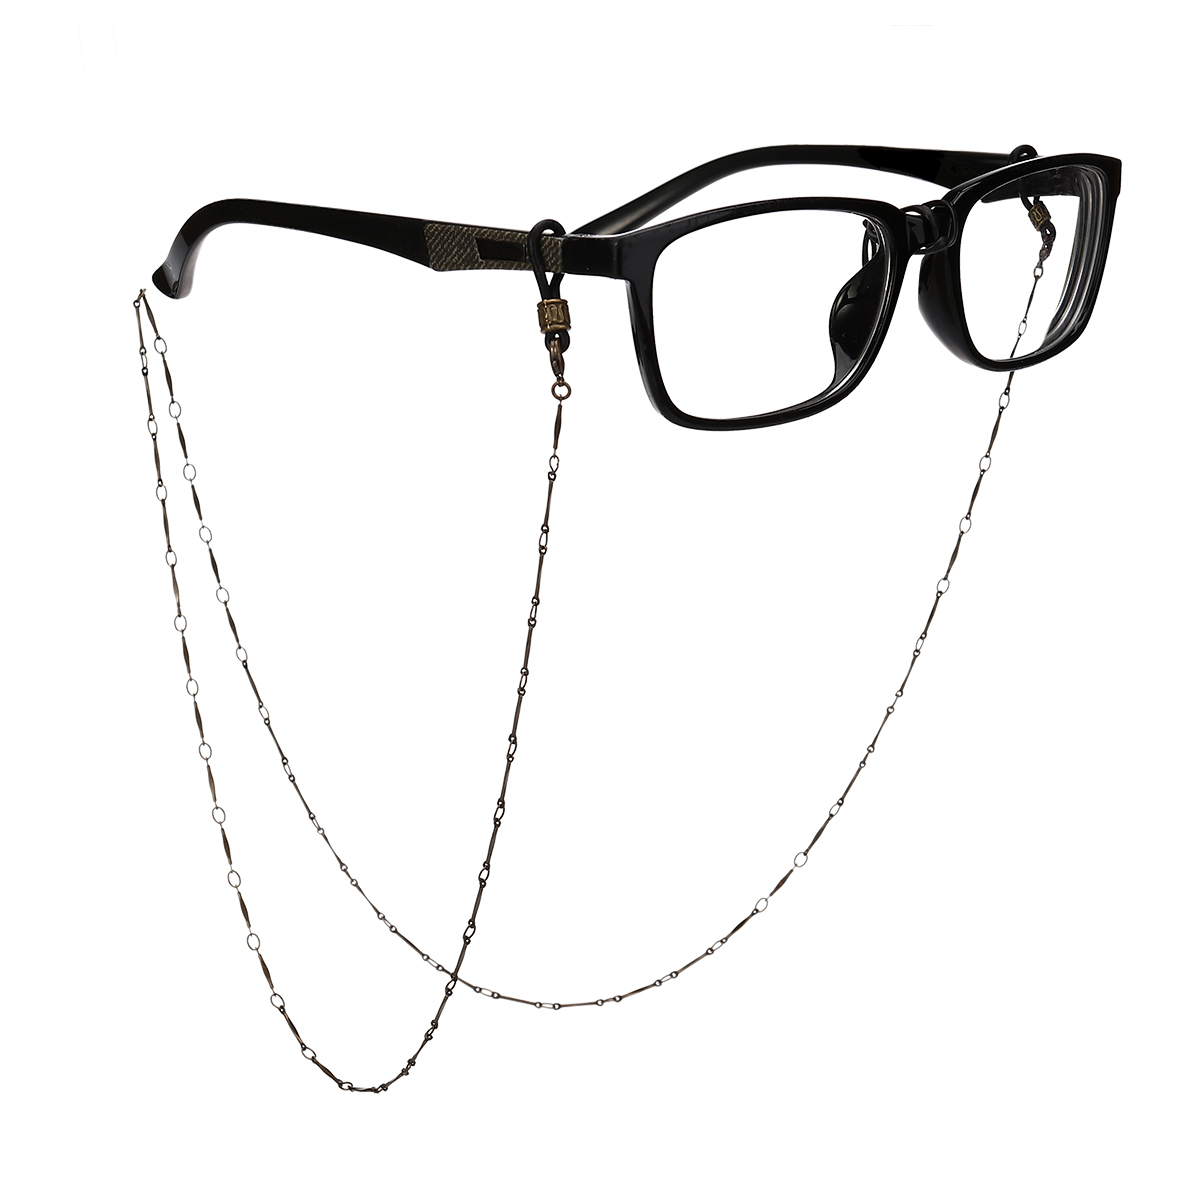 Lanyard Spectacle Premium Black Glasses Neck Cord Strap Sunglasses etc